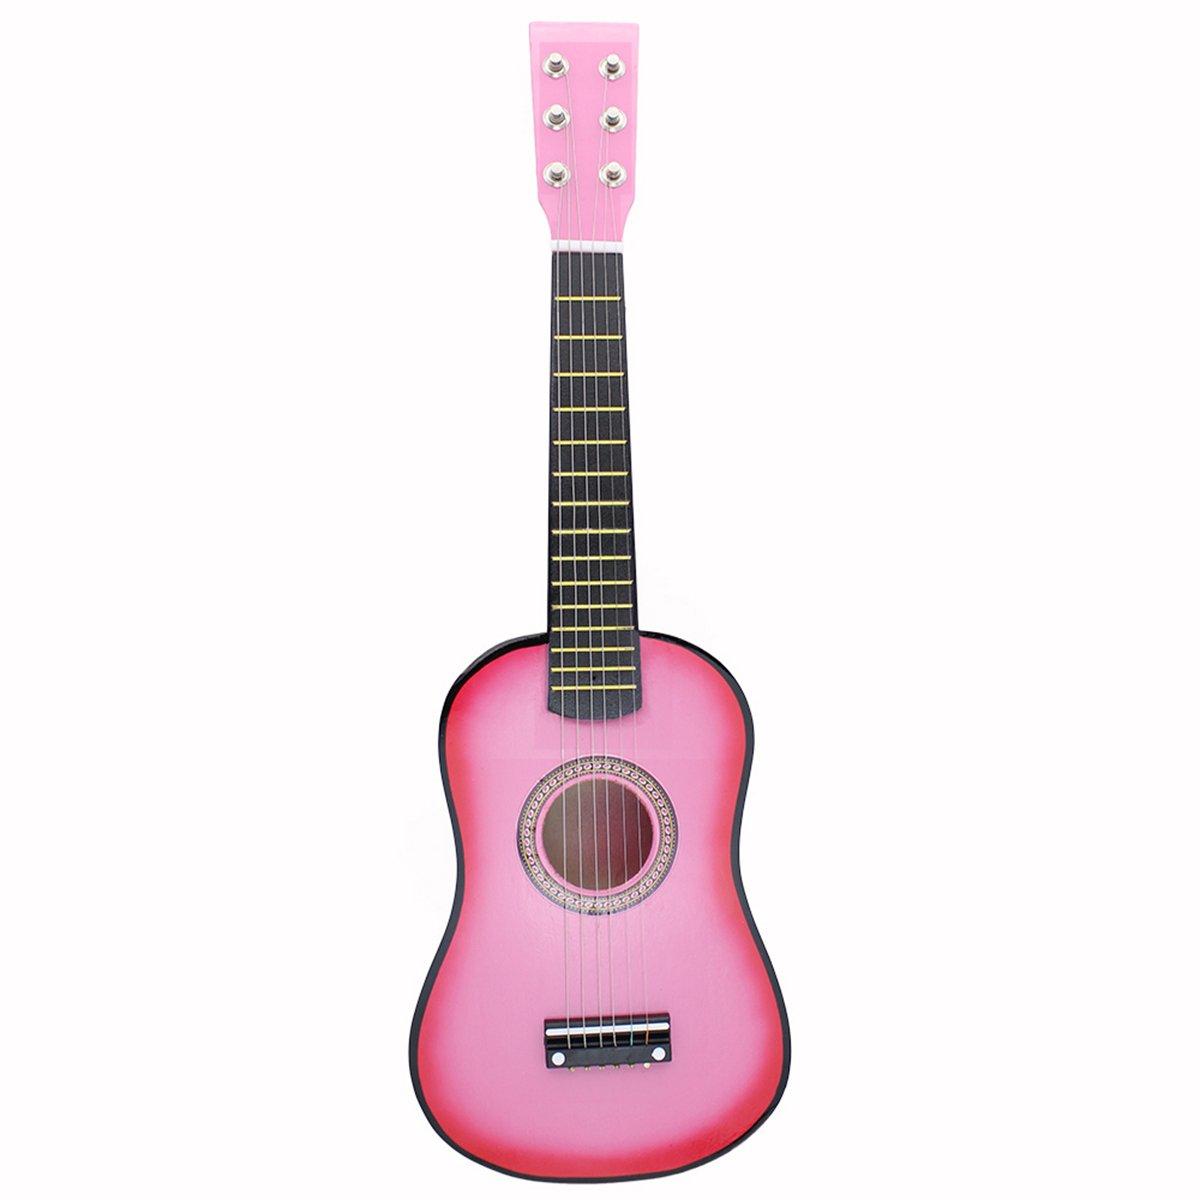 Blueseason Kids Guitar New Mini 23 Beginners Student Children Classical Acoustic Guitar, Blue